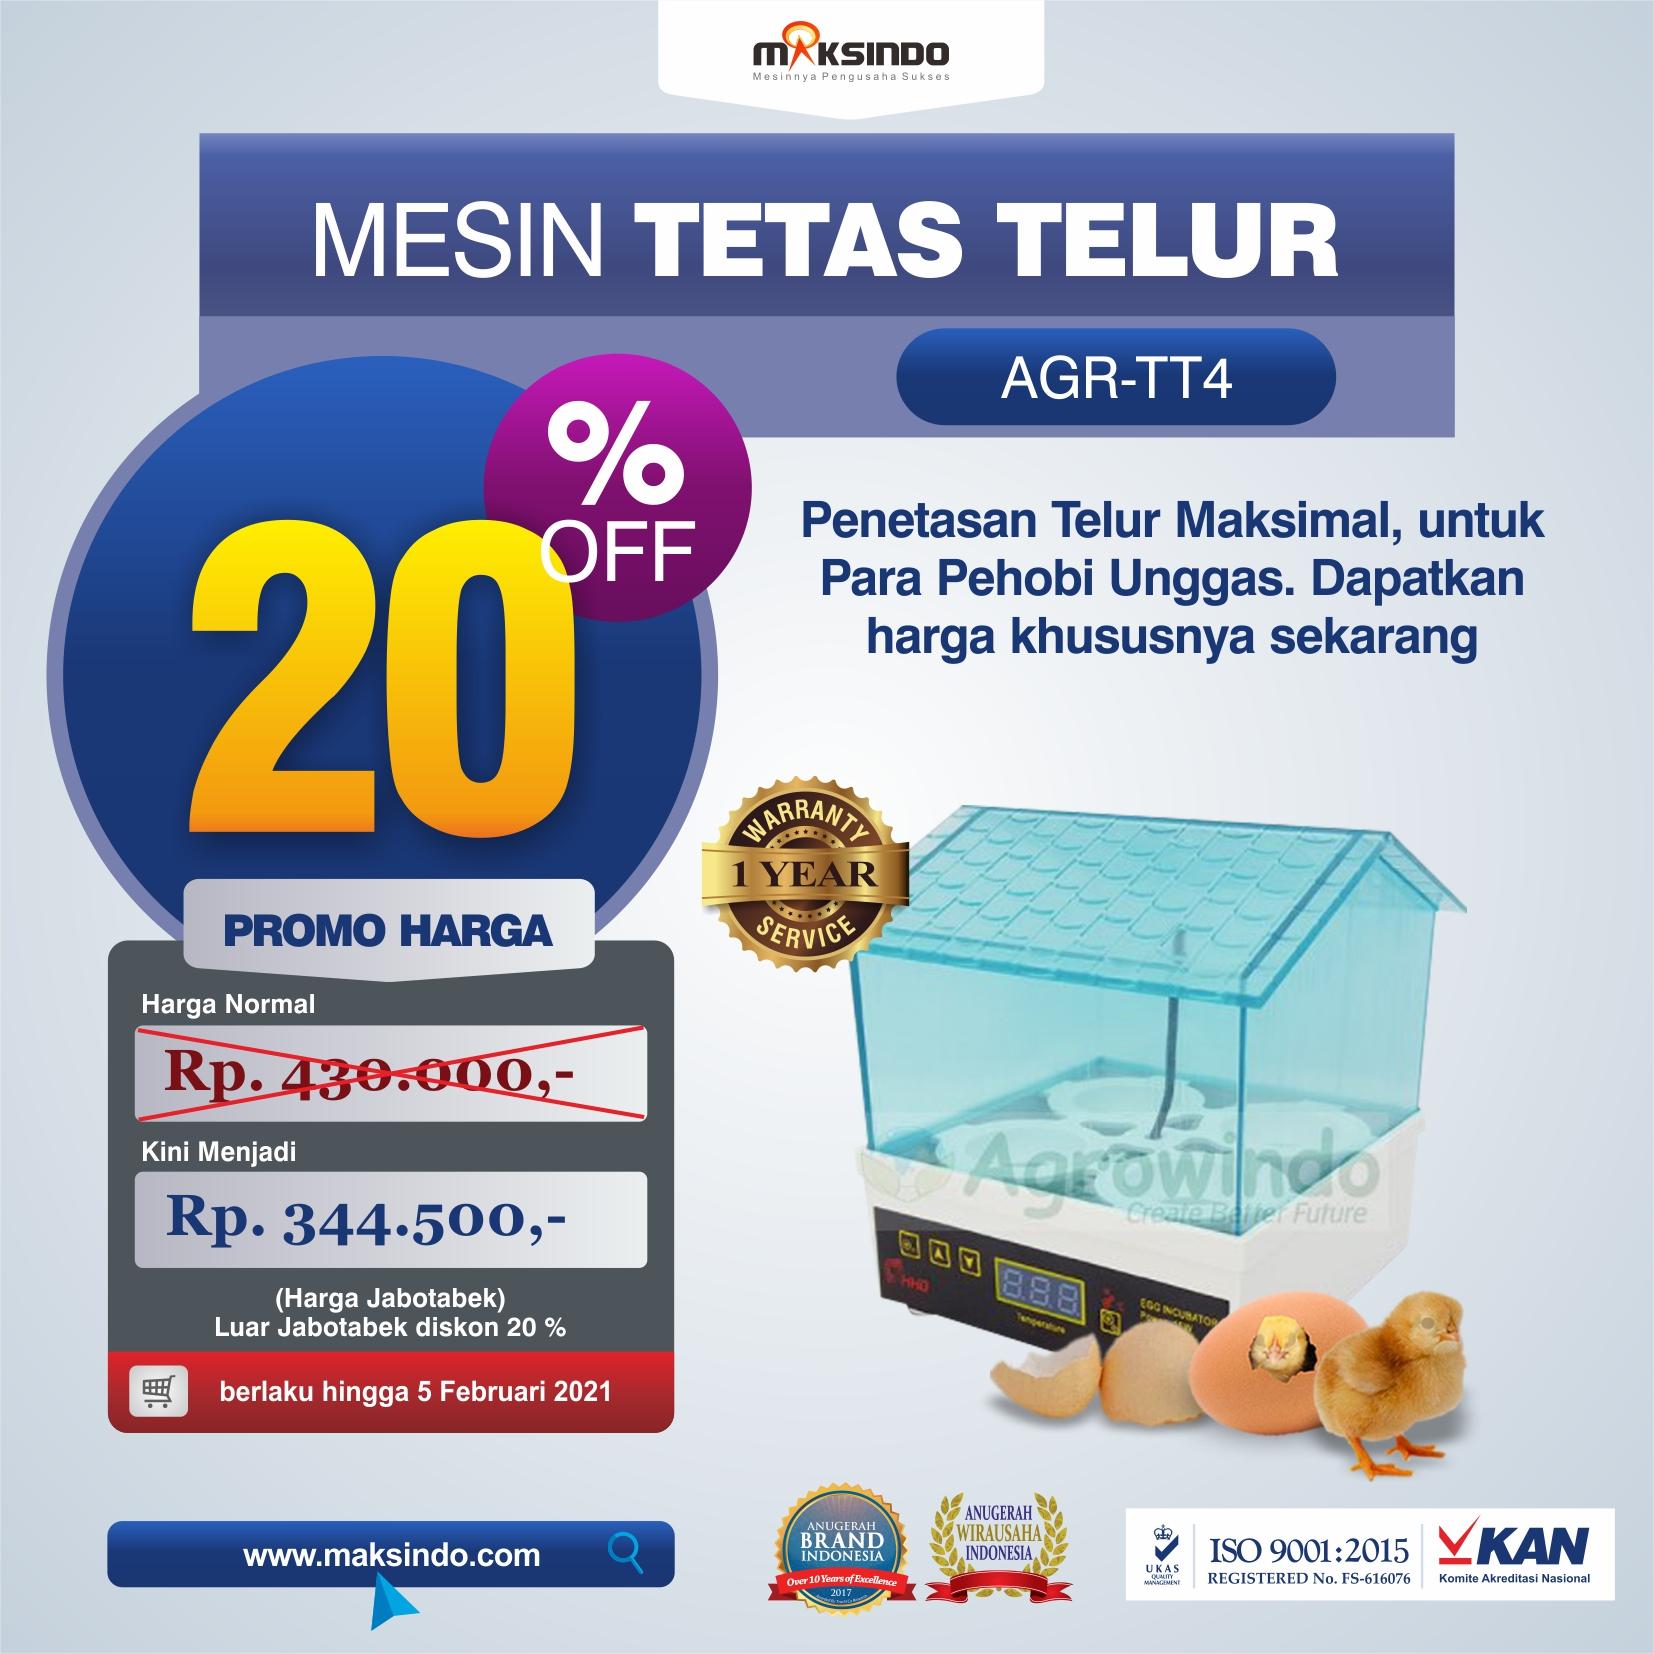 Jual Tetas Telur Mini 4 Butir (AGR-TT4) di Medan